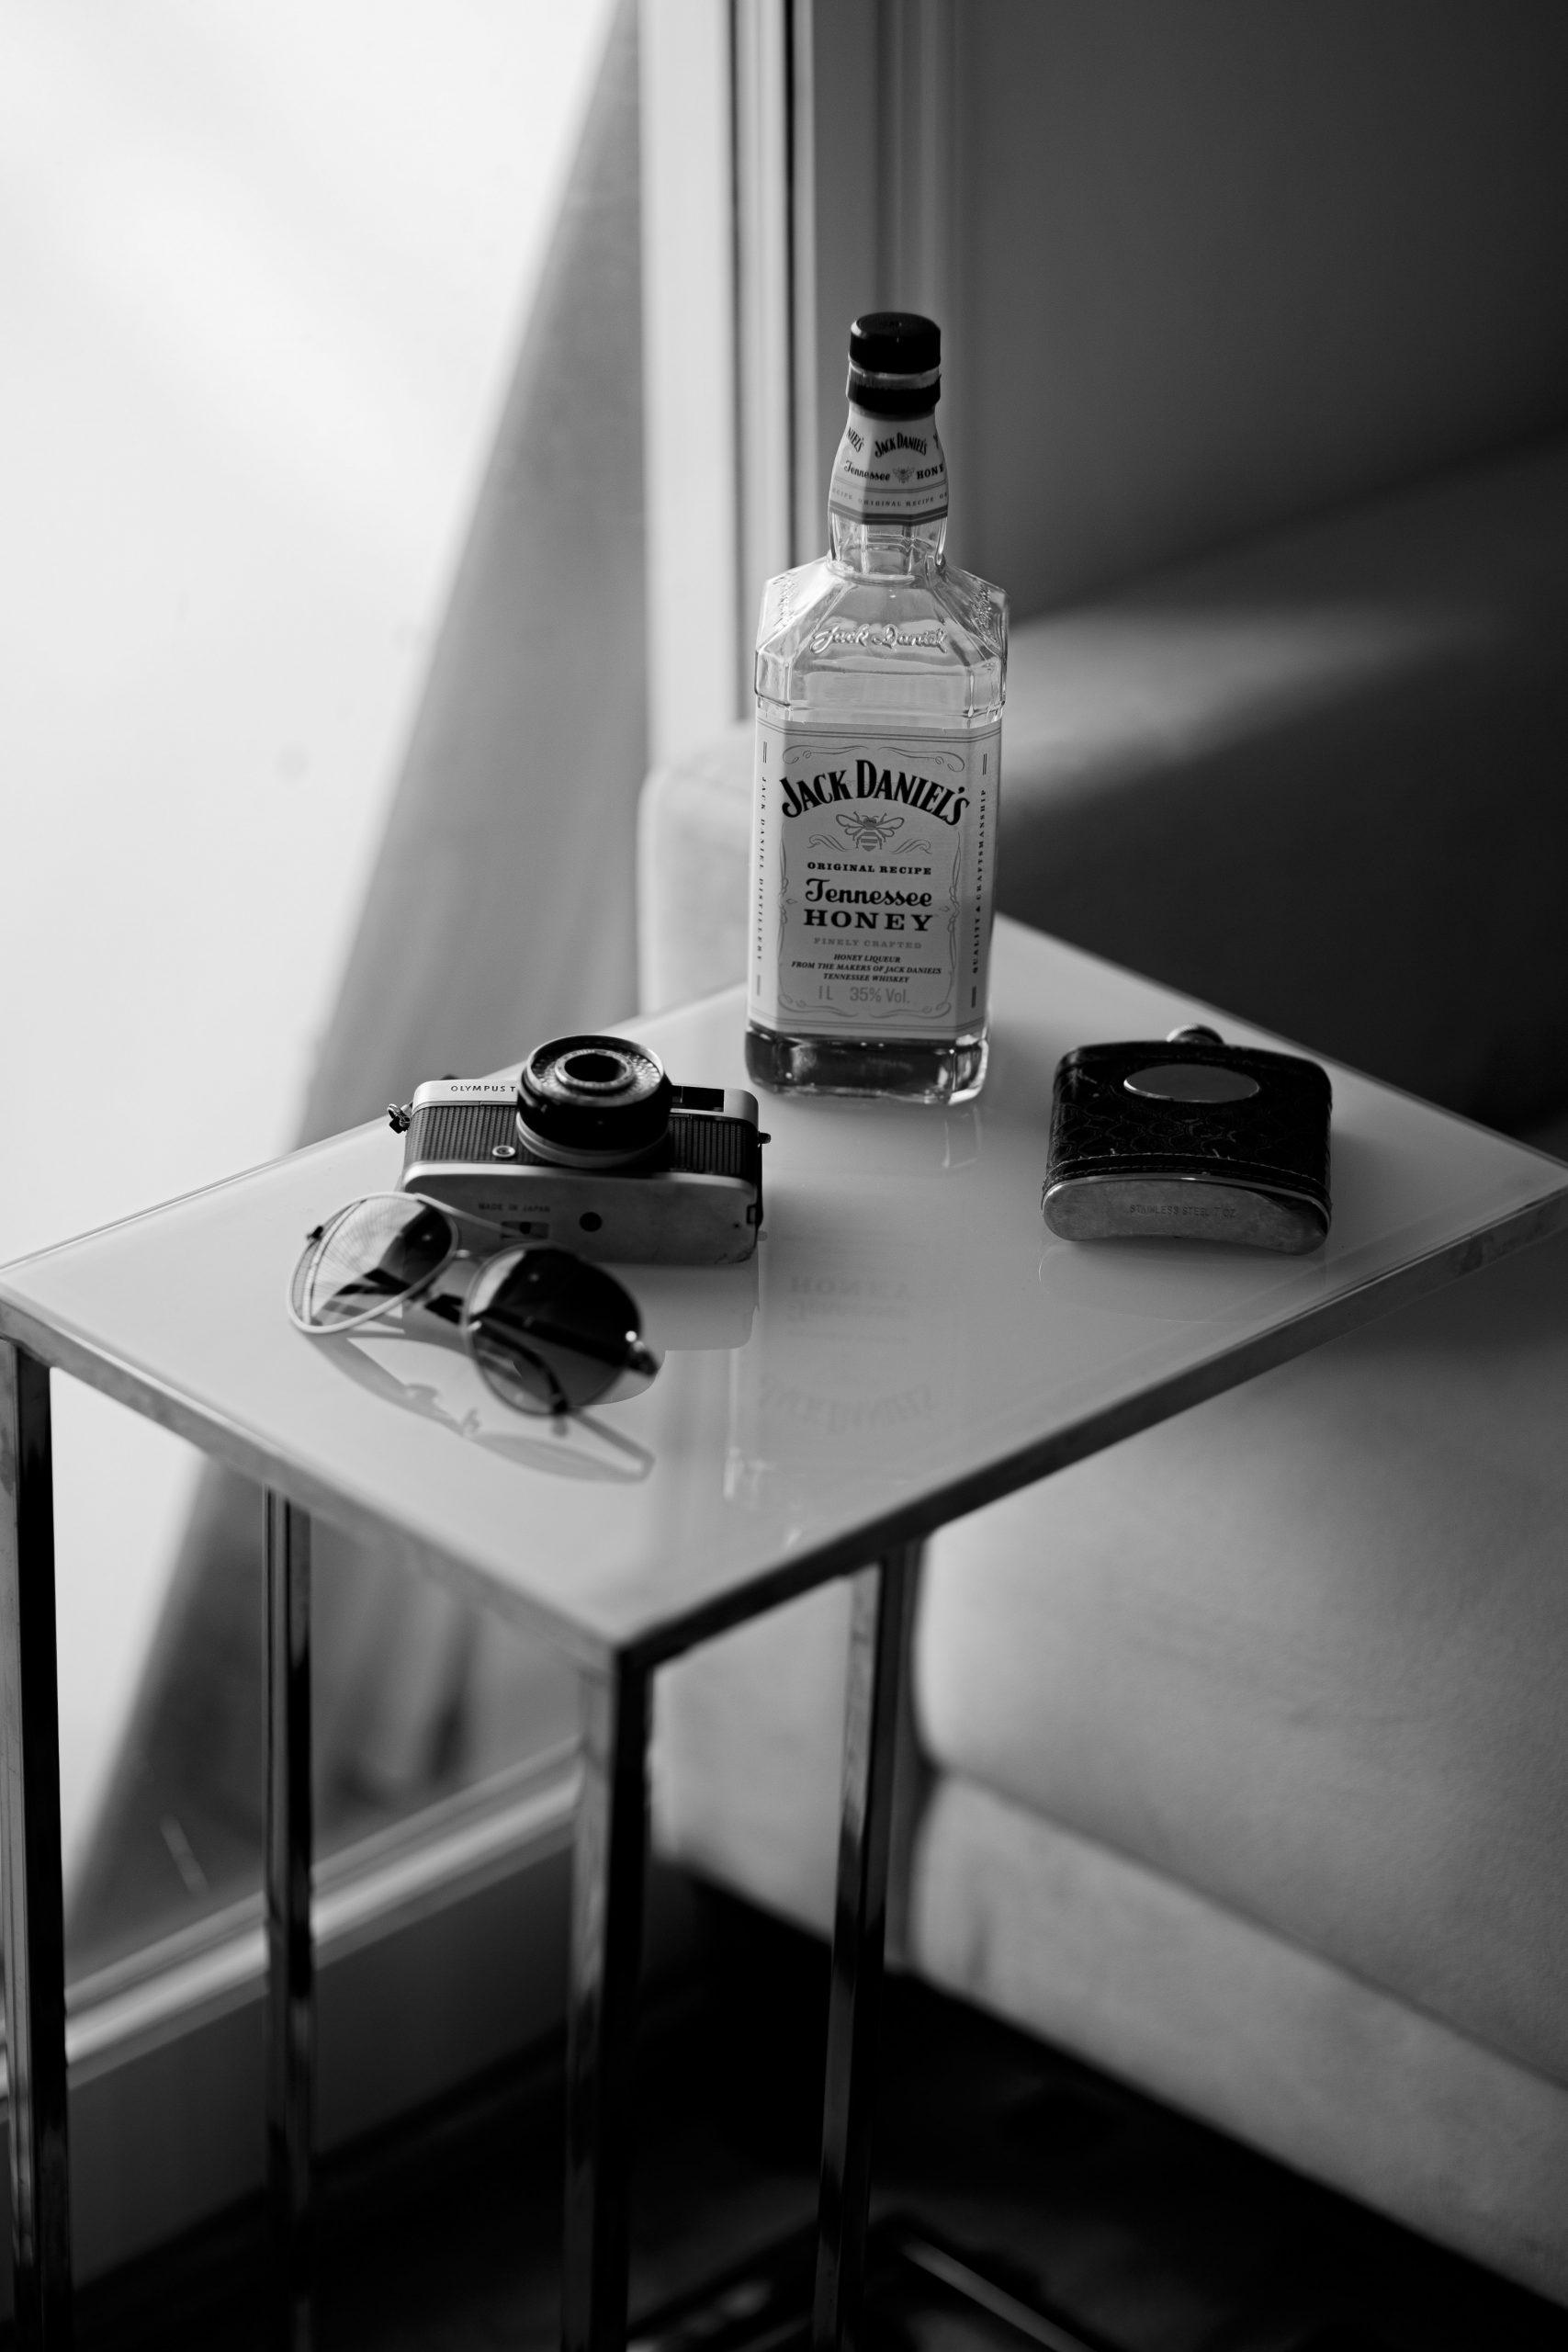 Jack Daniels Alcohol bottle on table